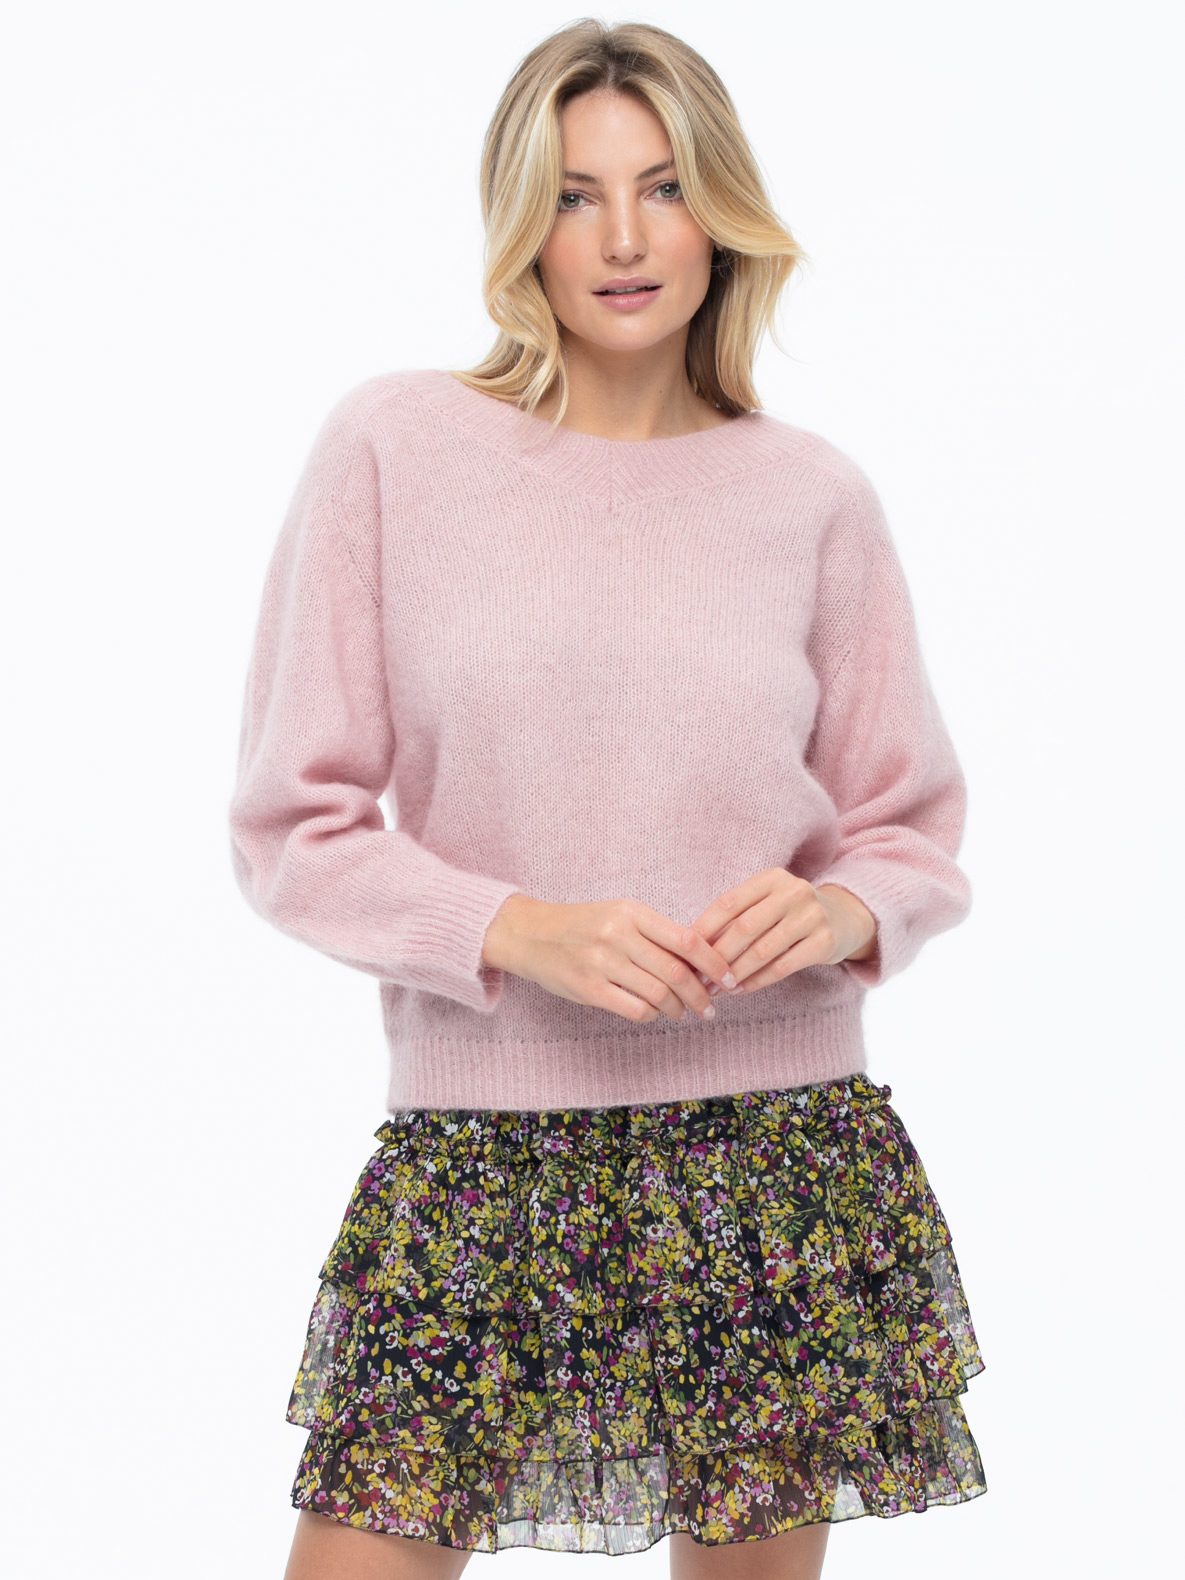 Sweater Oscar pink